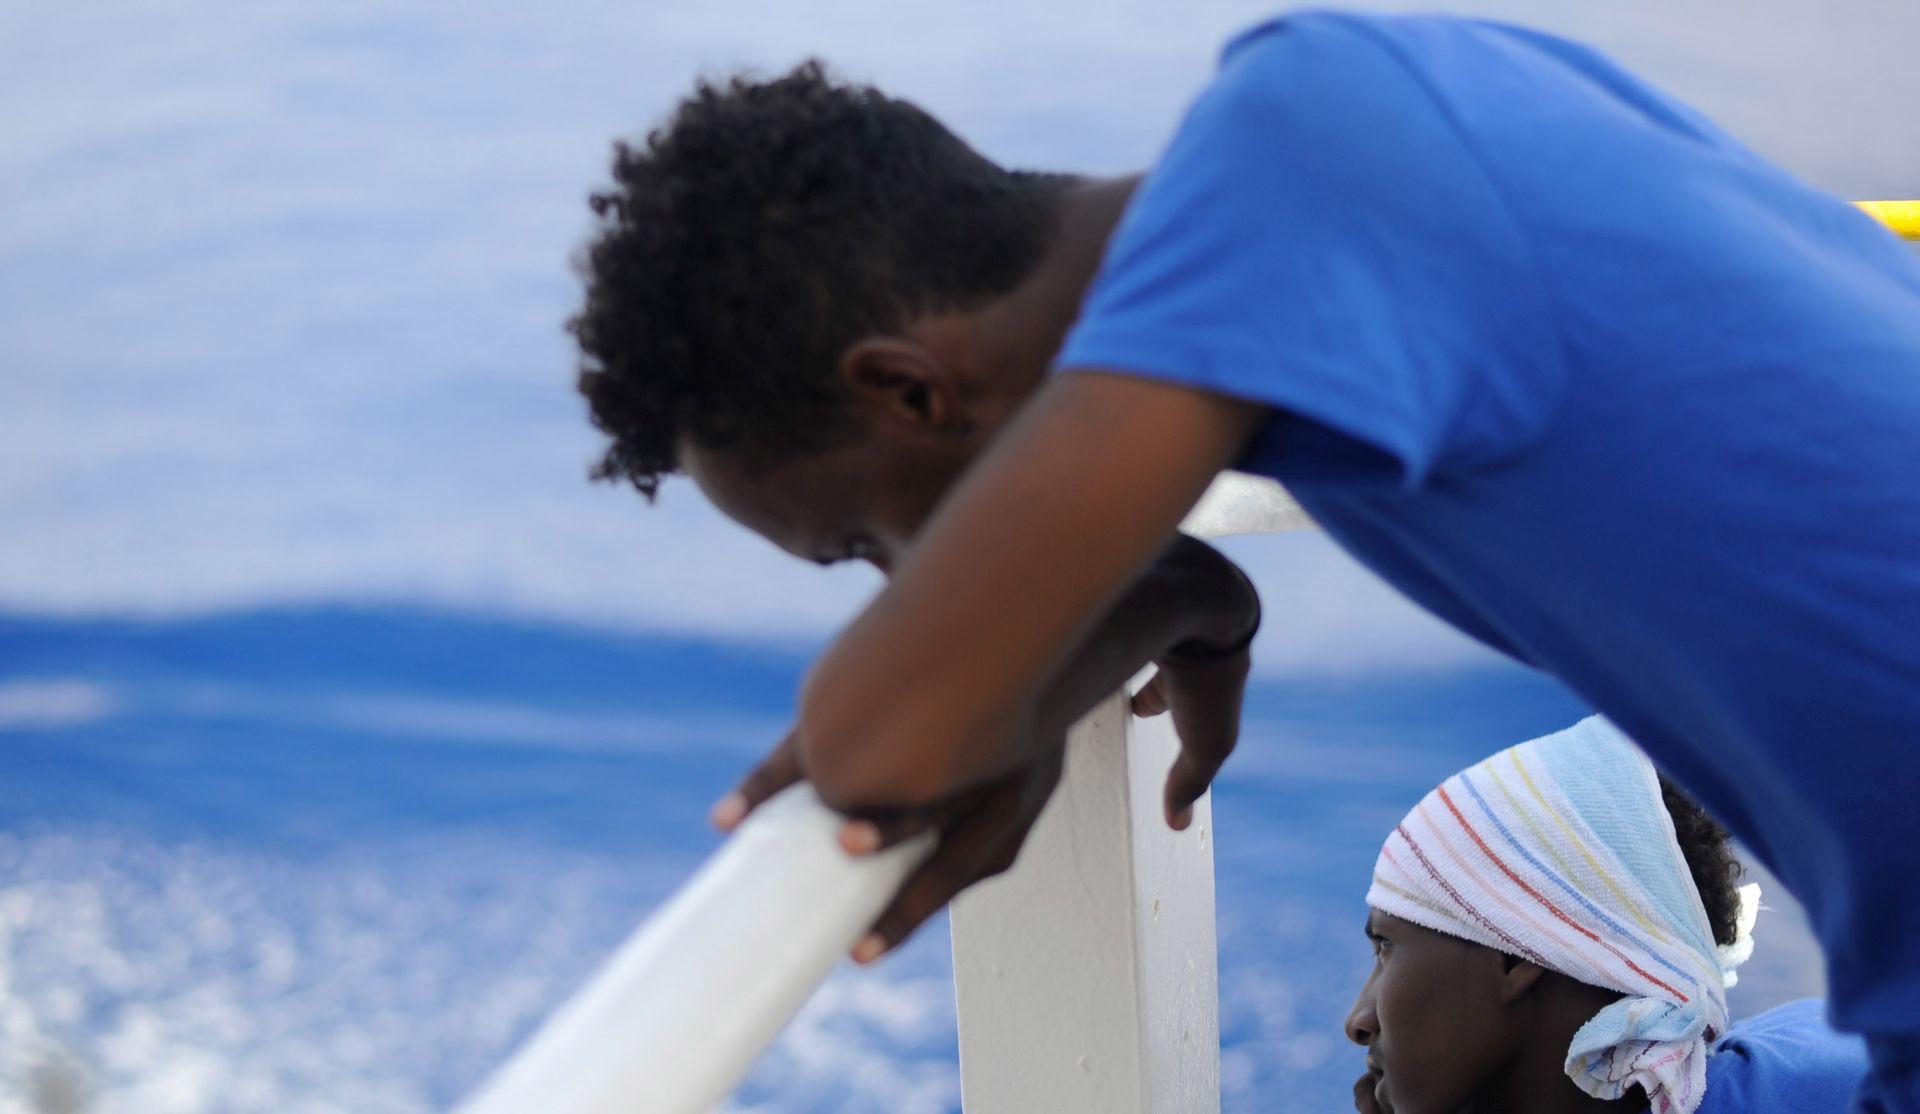 Italija odbija prihvatiti 141 migranta s Aquariusa